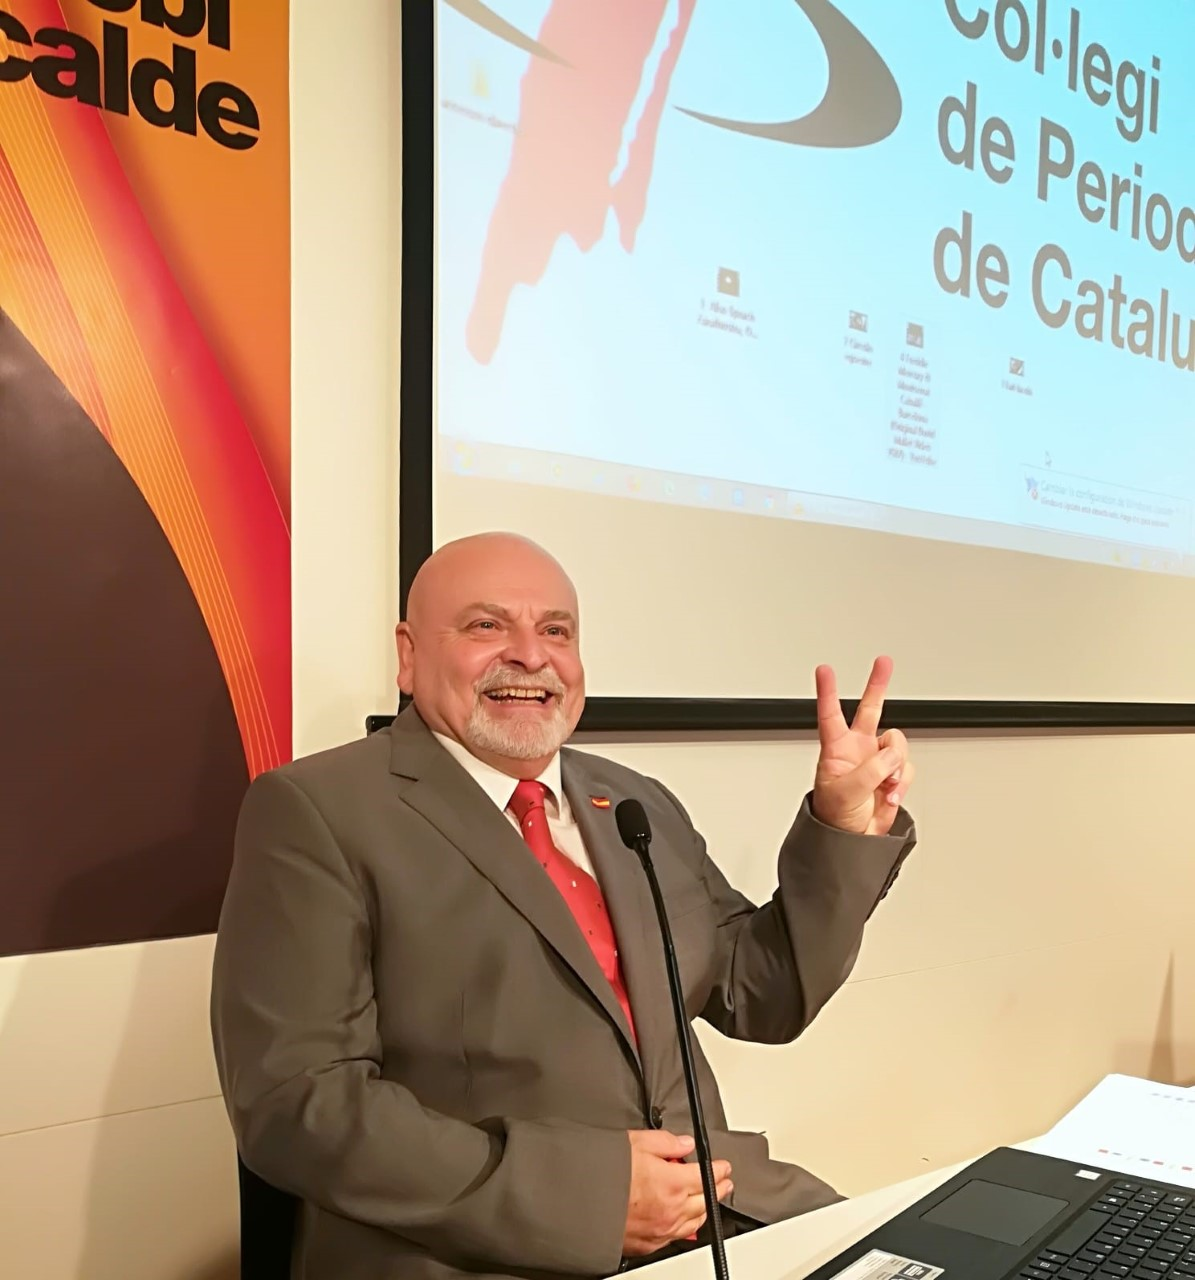 Karl Jacobi, empresario que increpó Torrent, presenta su candidatura a Barcelona